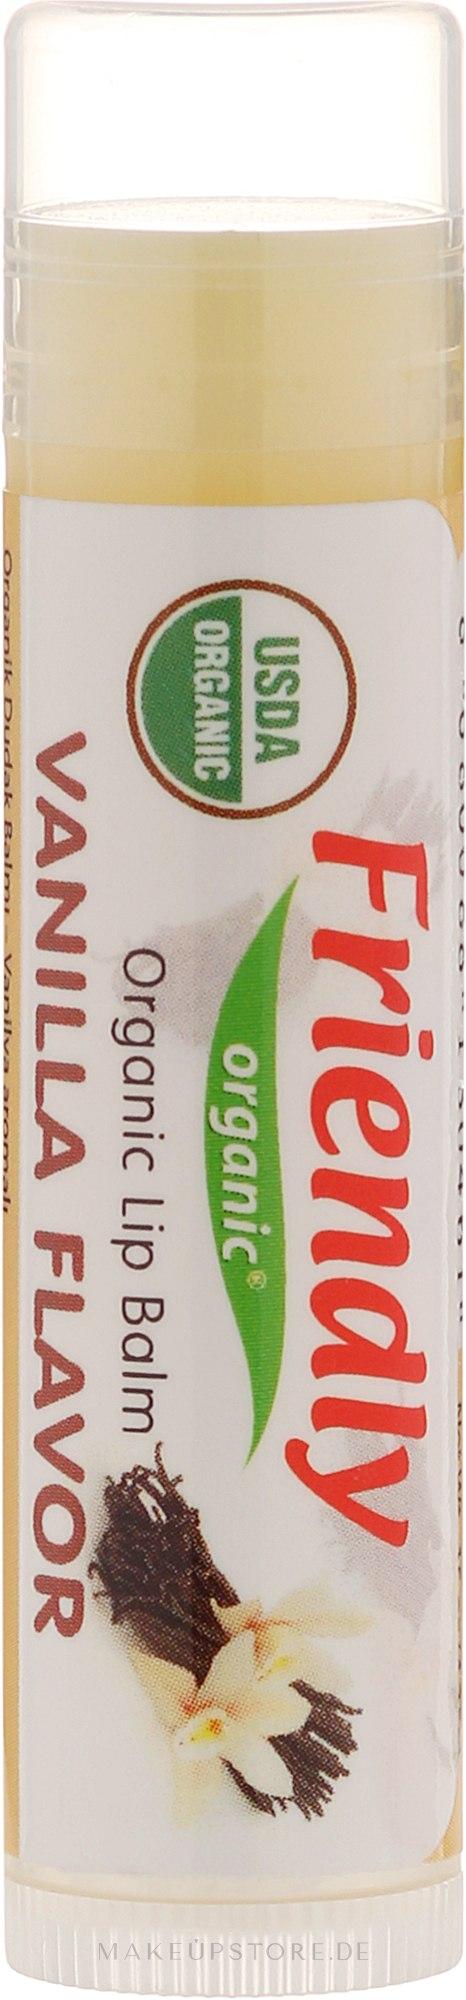 "Feuchtigkeitsspendender Lippenbalsam ""Vanille"" - Friendly Organic Lip Balm Vannilla — Bild 4.25 g"